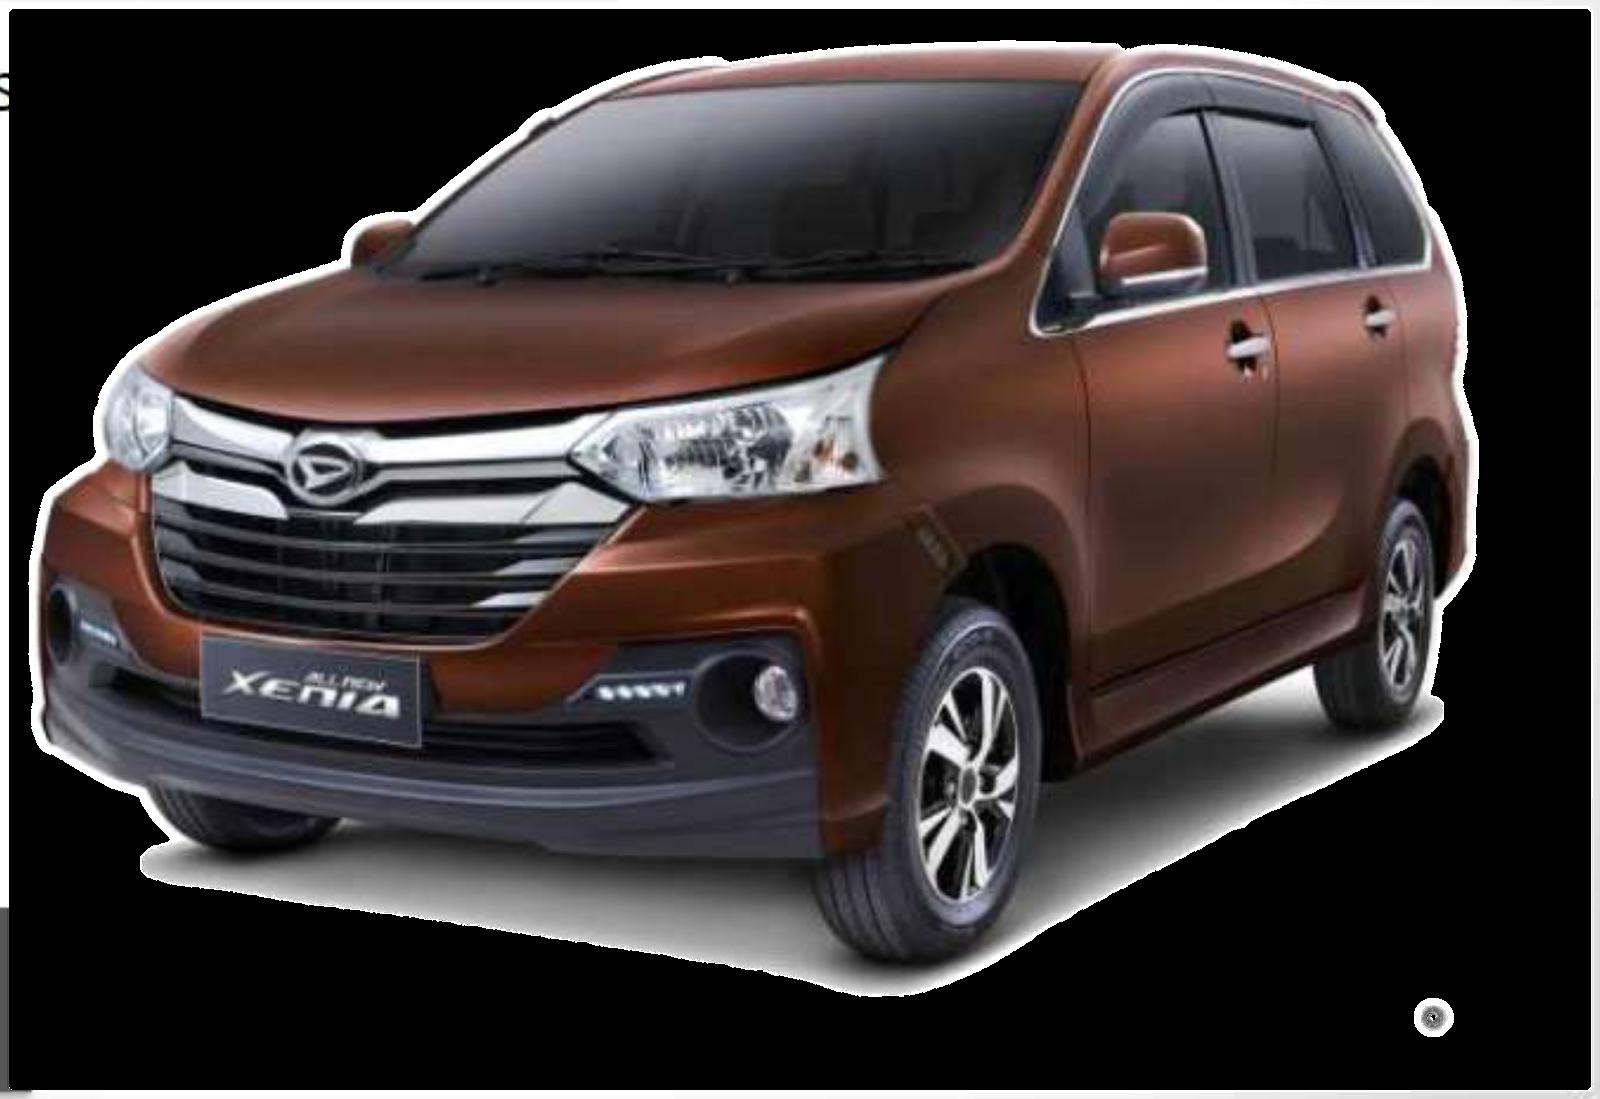 grand new avanza vs great xenia e g trijaya rentcar rental mobil ketapang